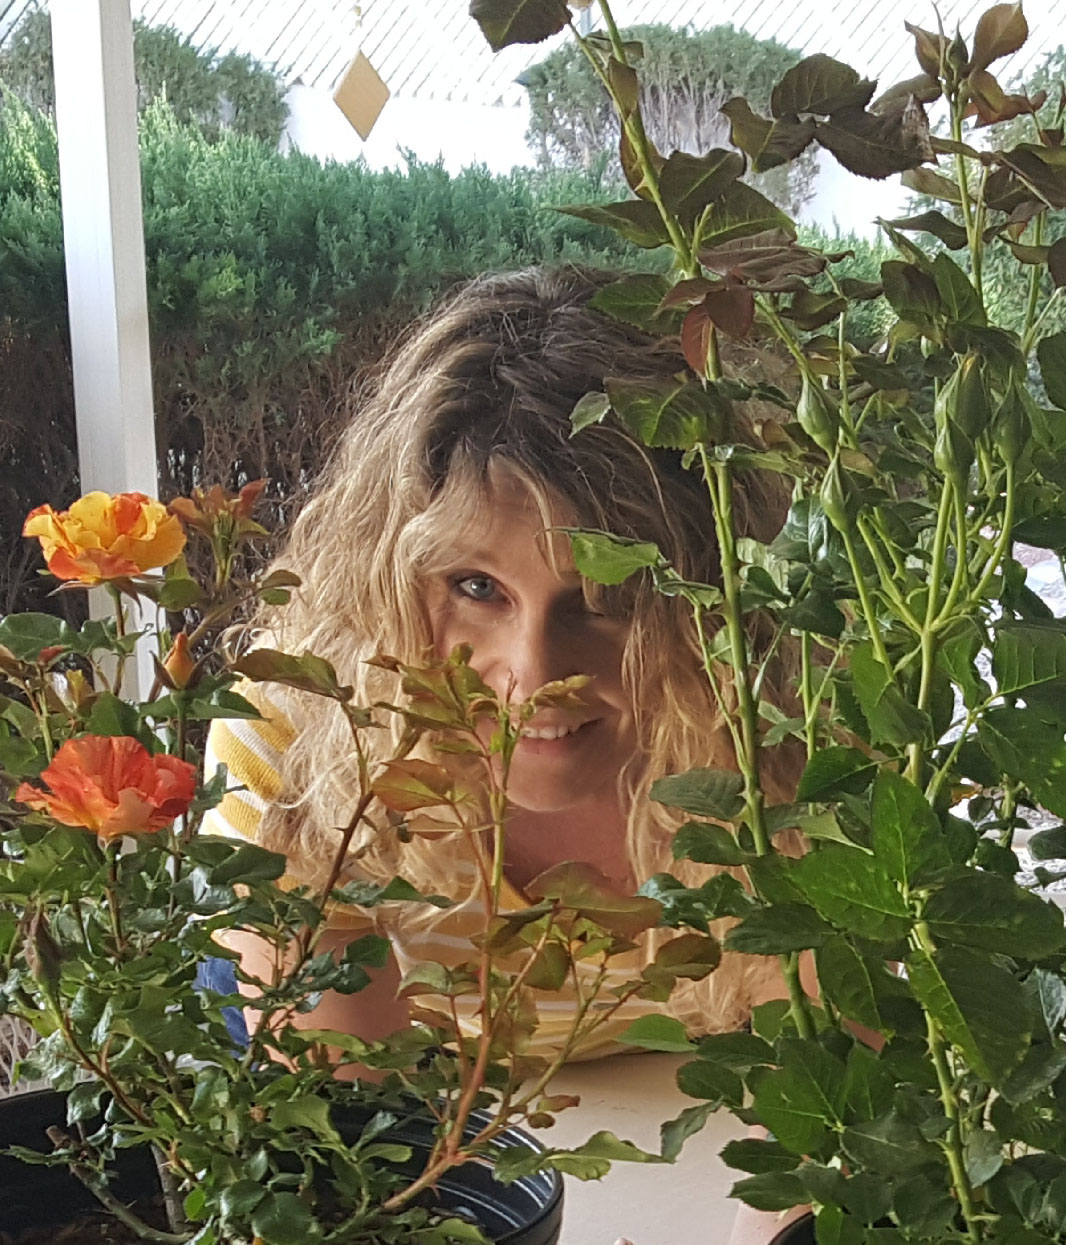 Teresa Cutler-Broyles